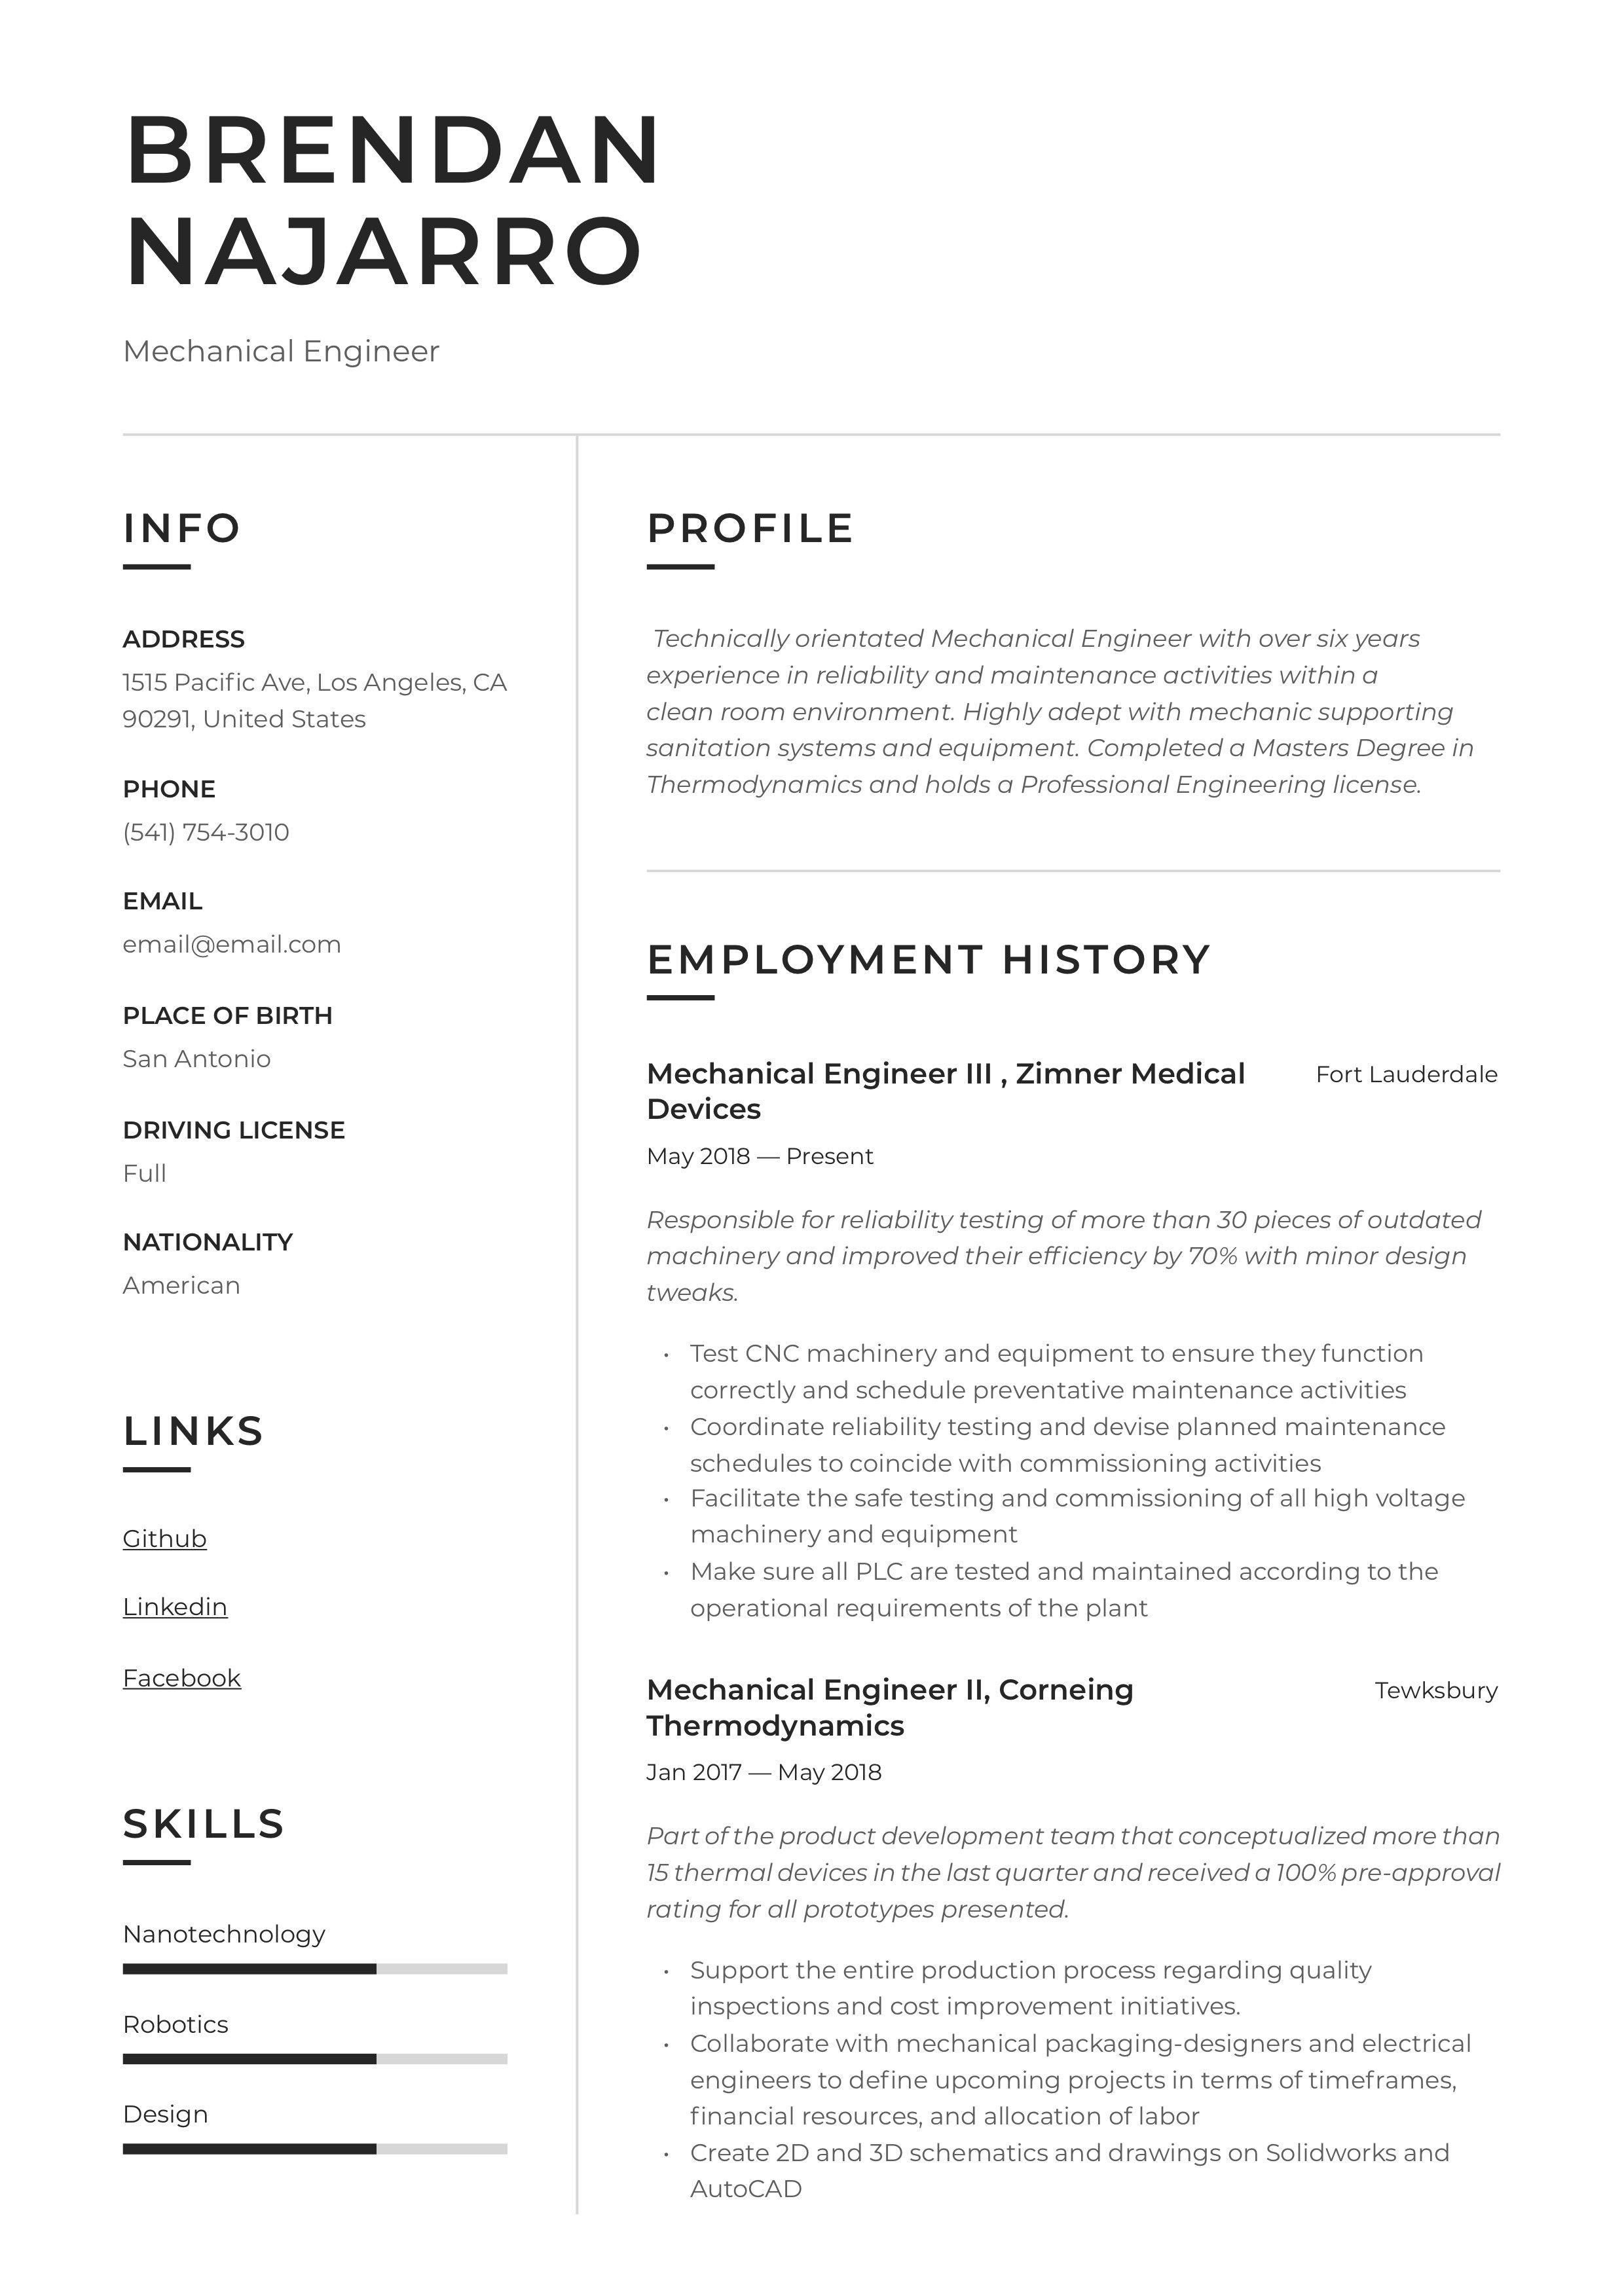 Mechanical Engineer Resume & Writing Guide in 2020